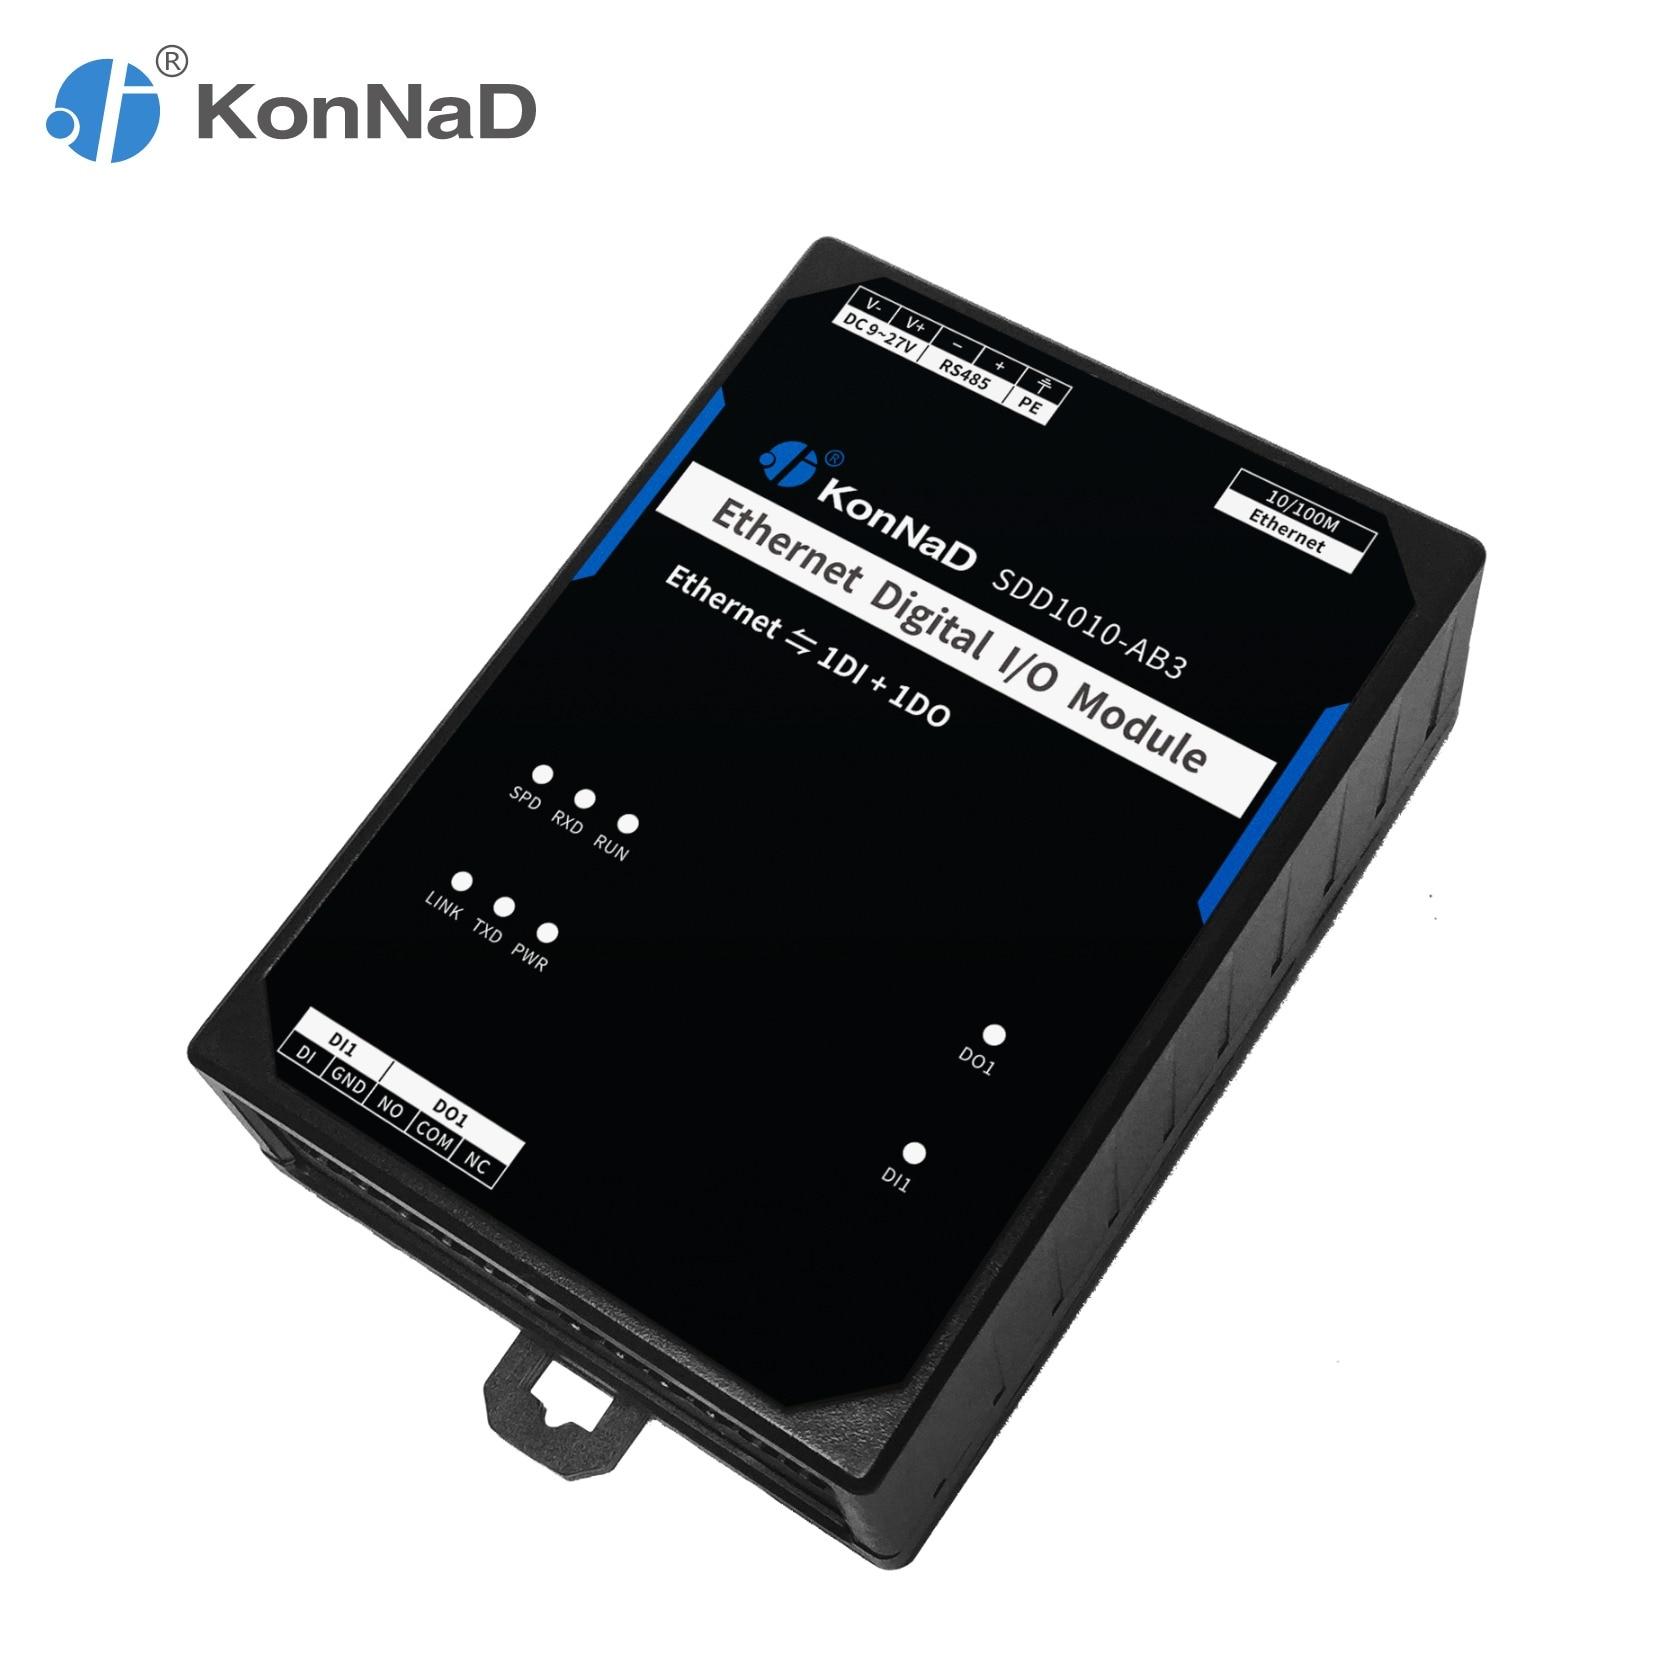 Ethernet Remote IO Controller Module 1DI 1DO Pulse Count Form C Relay KonNaD RTU Master Modbus TCP Communication